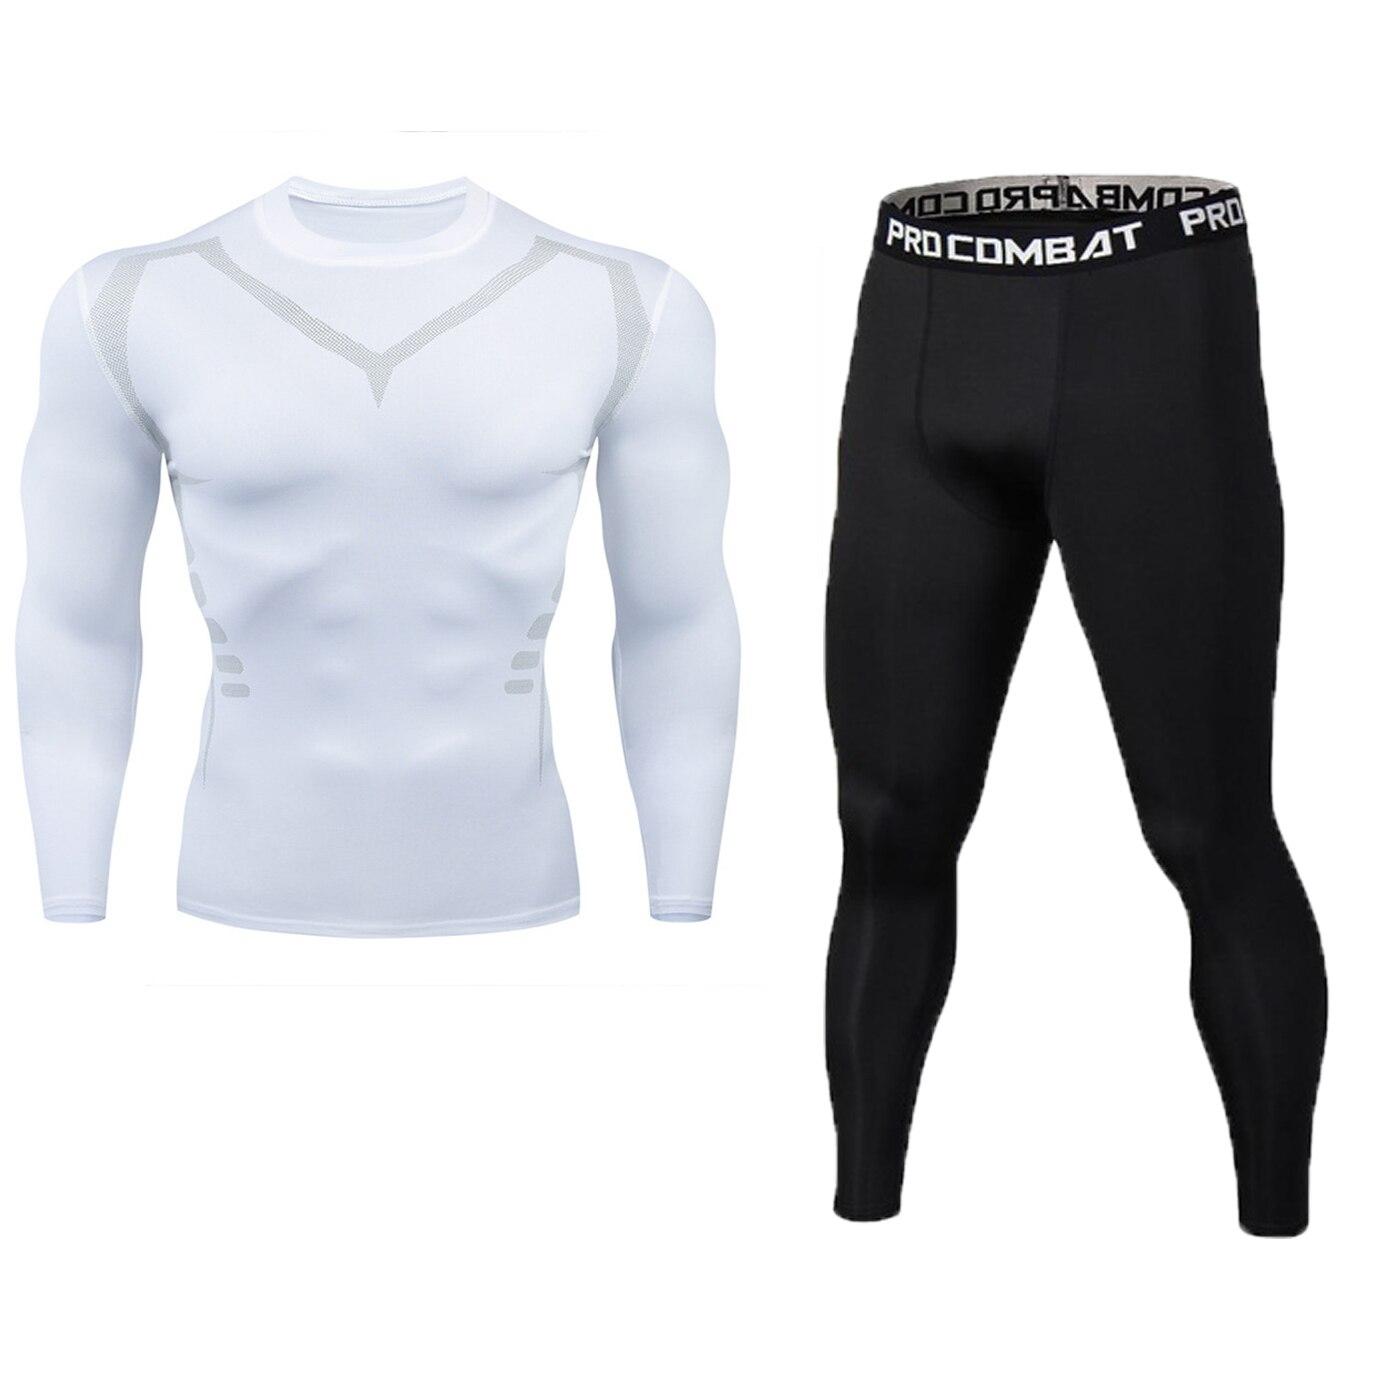 Neue Fitness männer Set Reine Schwarz Kompression Top + Leggings Unterwäsche Crossfit Langarm + Kurzarm T-Shirt Bekleidung set